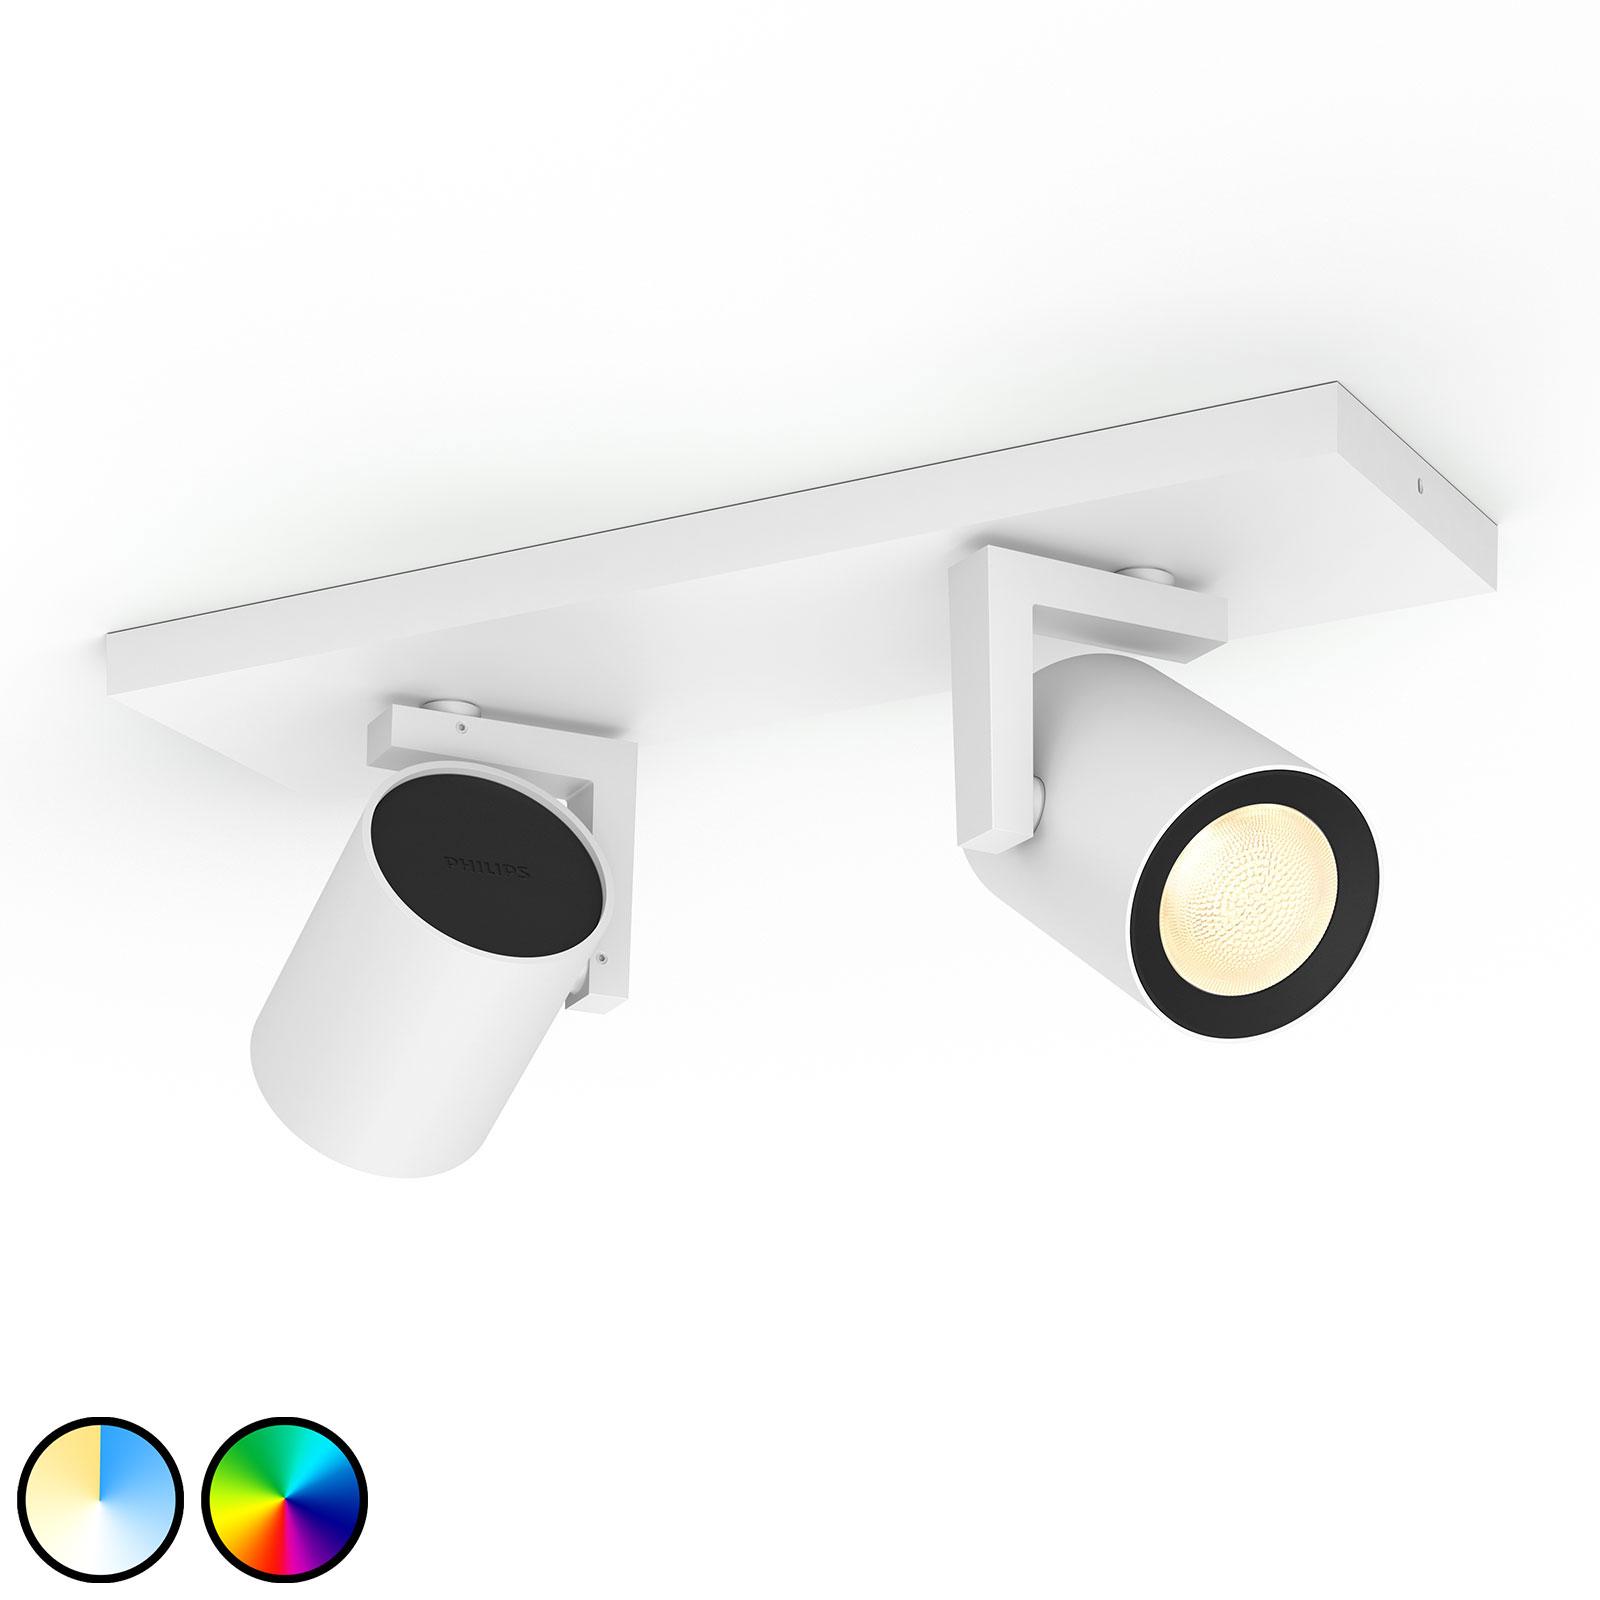 Philips Hue Argenta foco LED, 2 luces, blanco